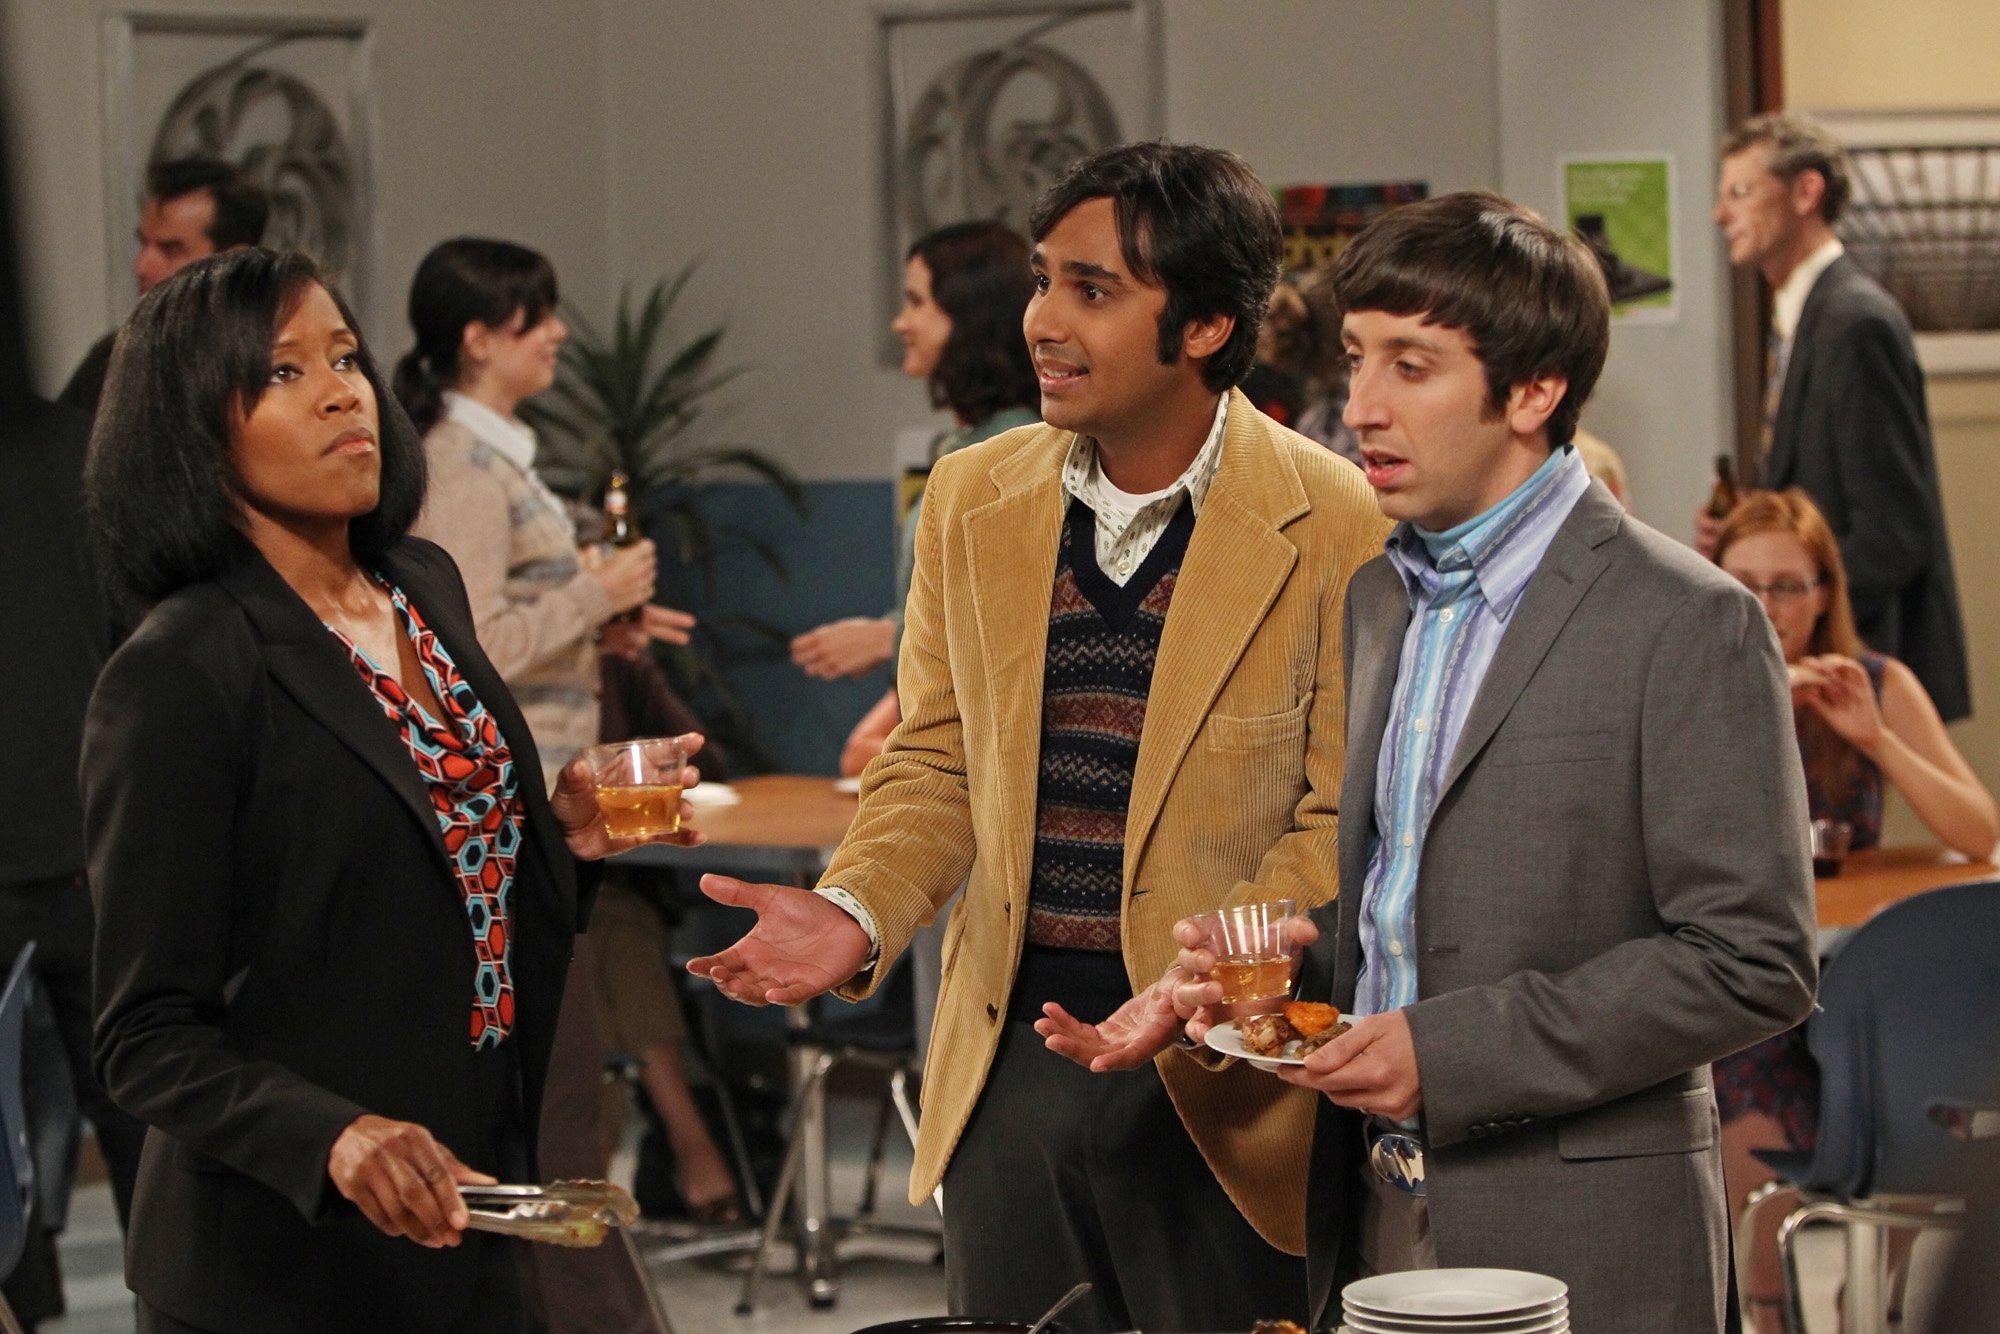 The Big Bang Theory welcomes back Oscar winner Regina King as HR admin Janine